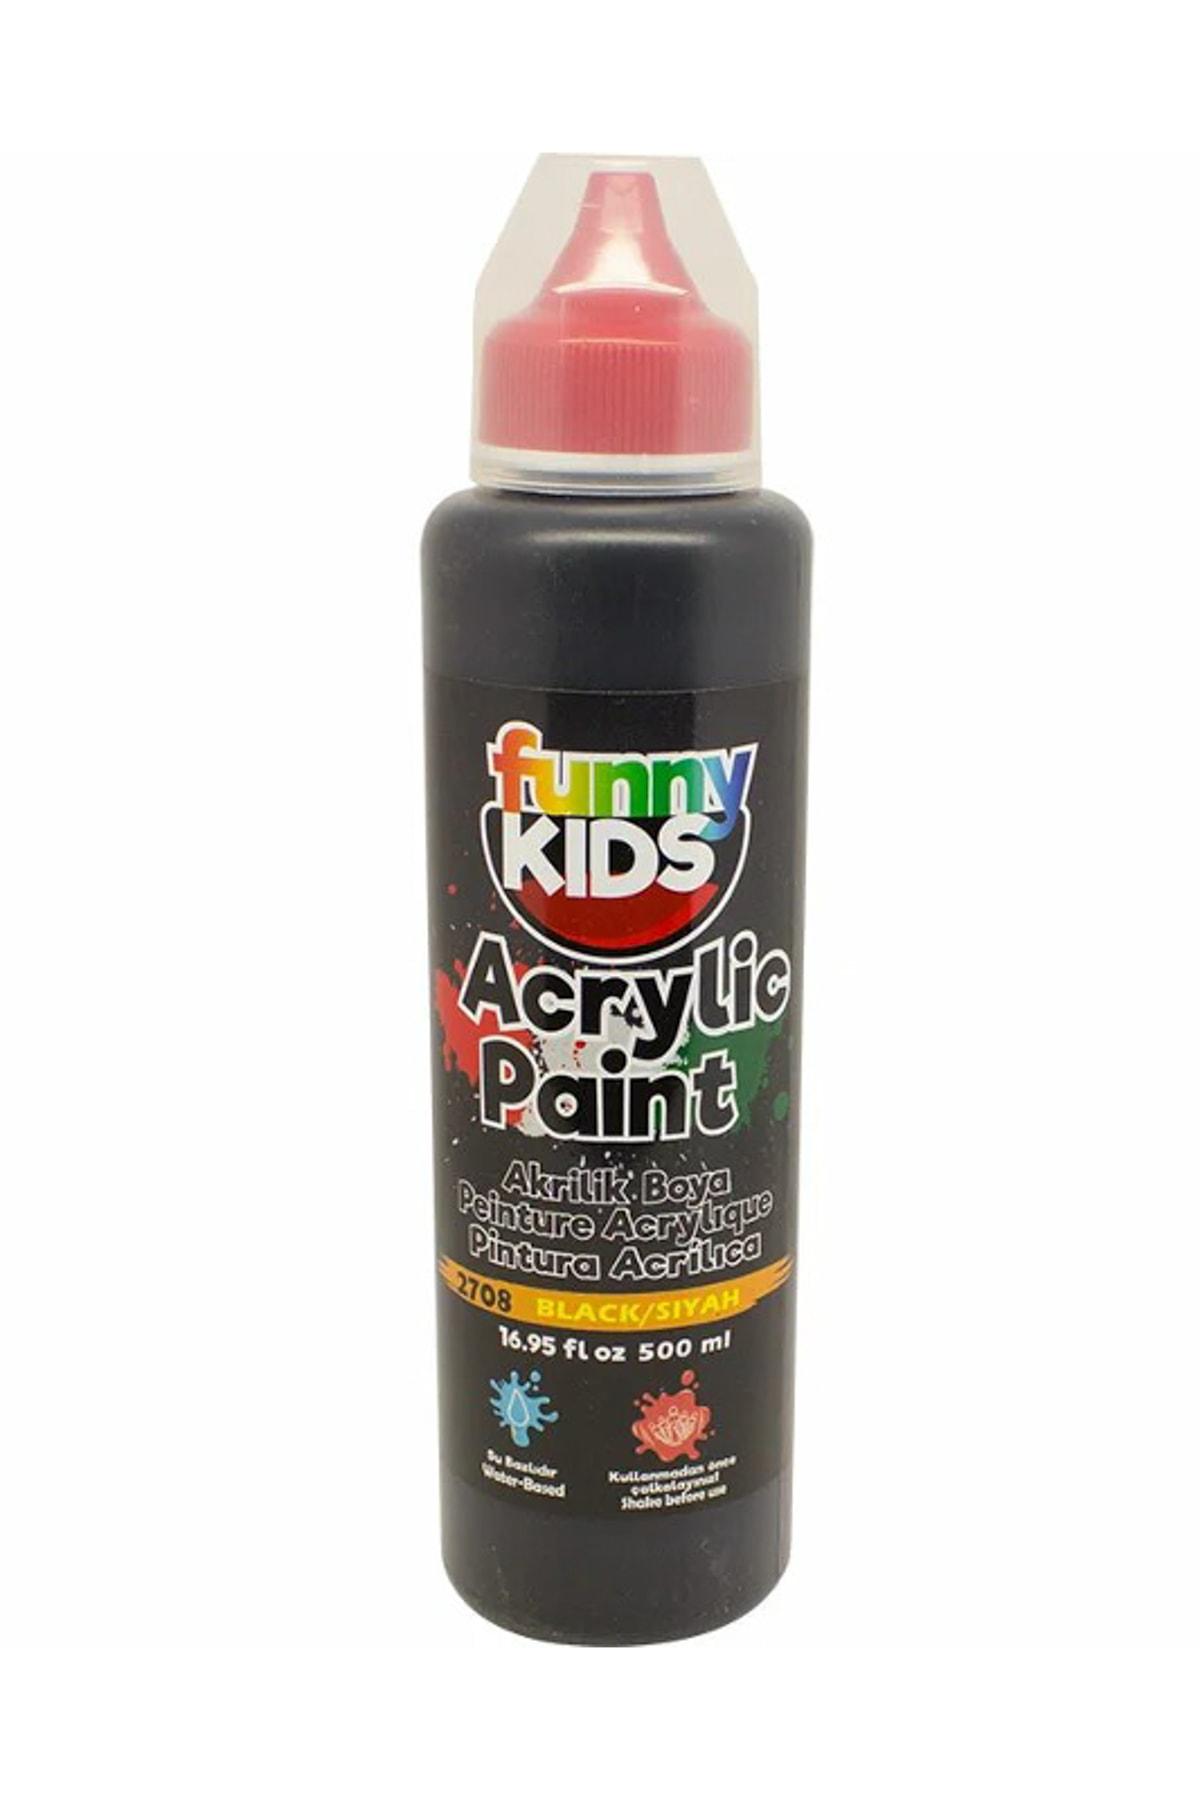 Rich Funny Kids Akrilik Boya 500ml - 2708 Siyah 1